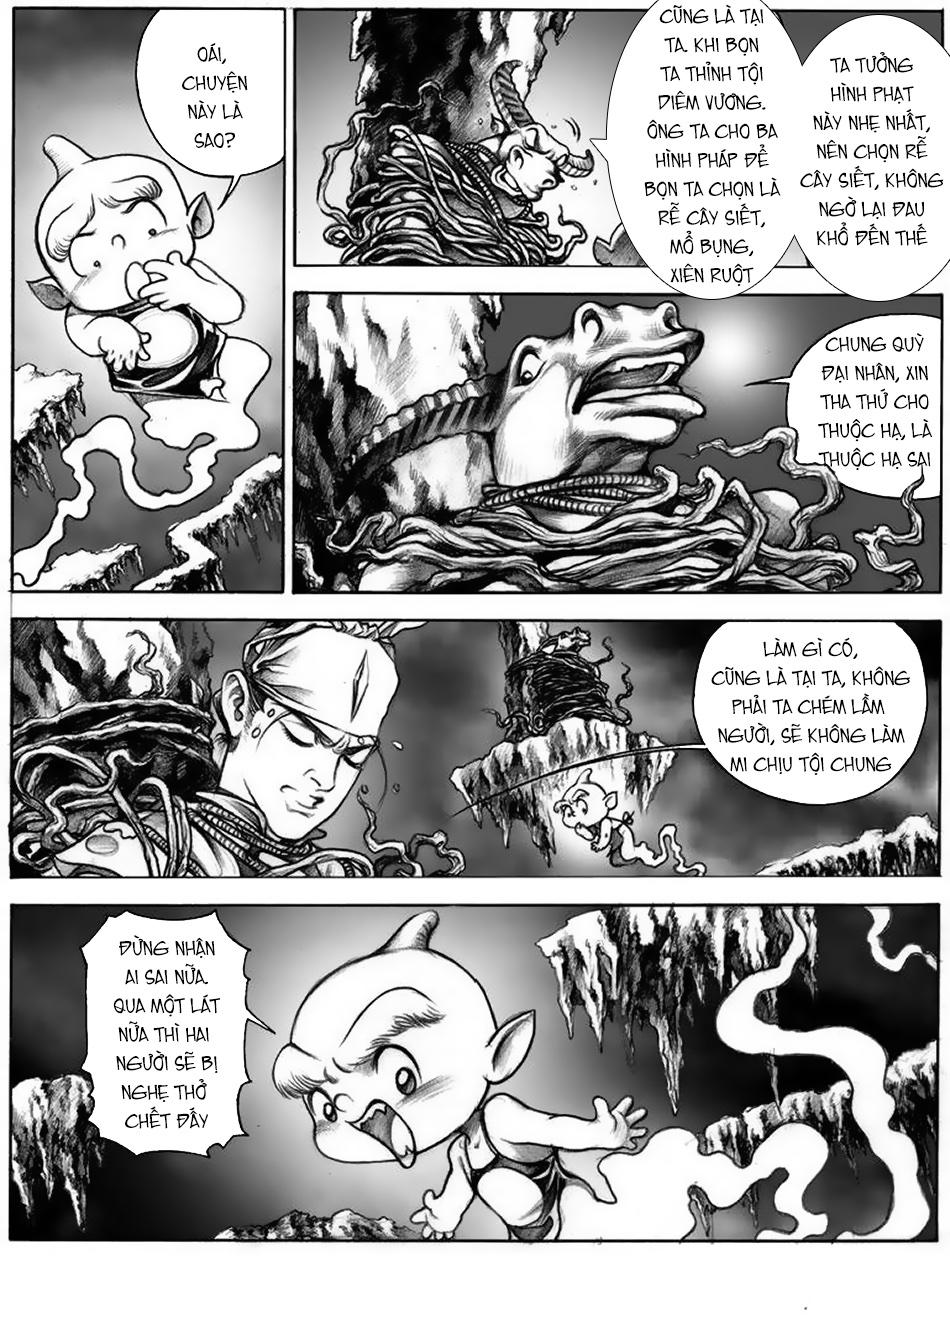 Chung Quỳ Truyền Kỳ Chapter 12 - Hamtruyen.vn